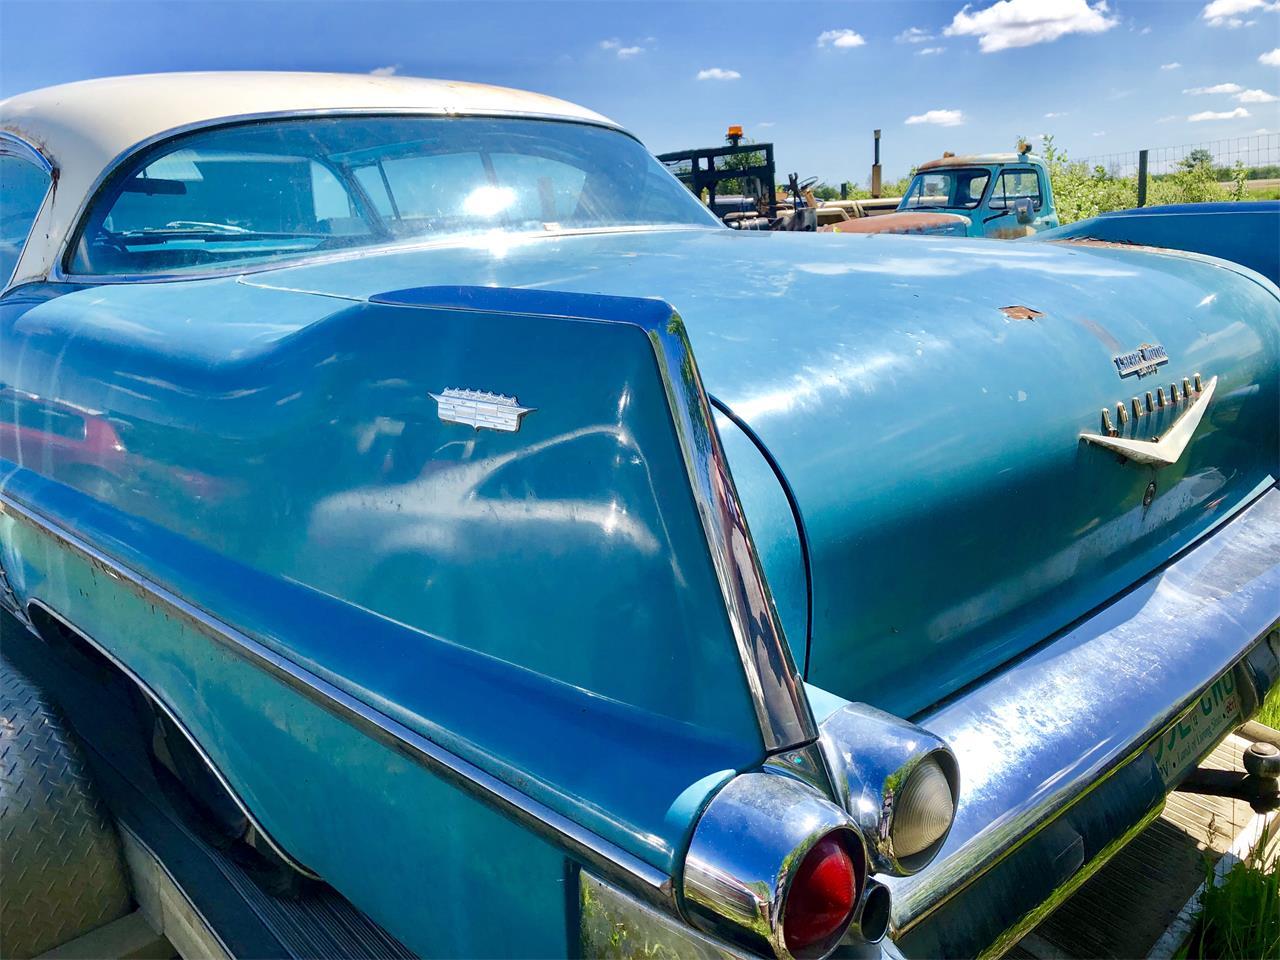 1957 Cadillac Coupe DeVille (CC-1229689) for sale in Leduc, Alberta